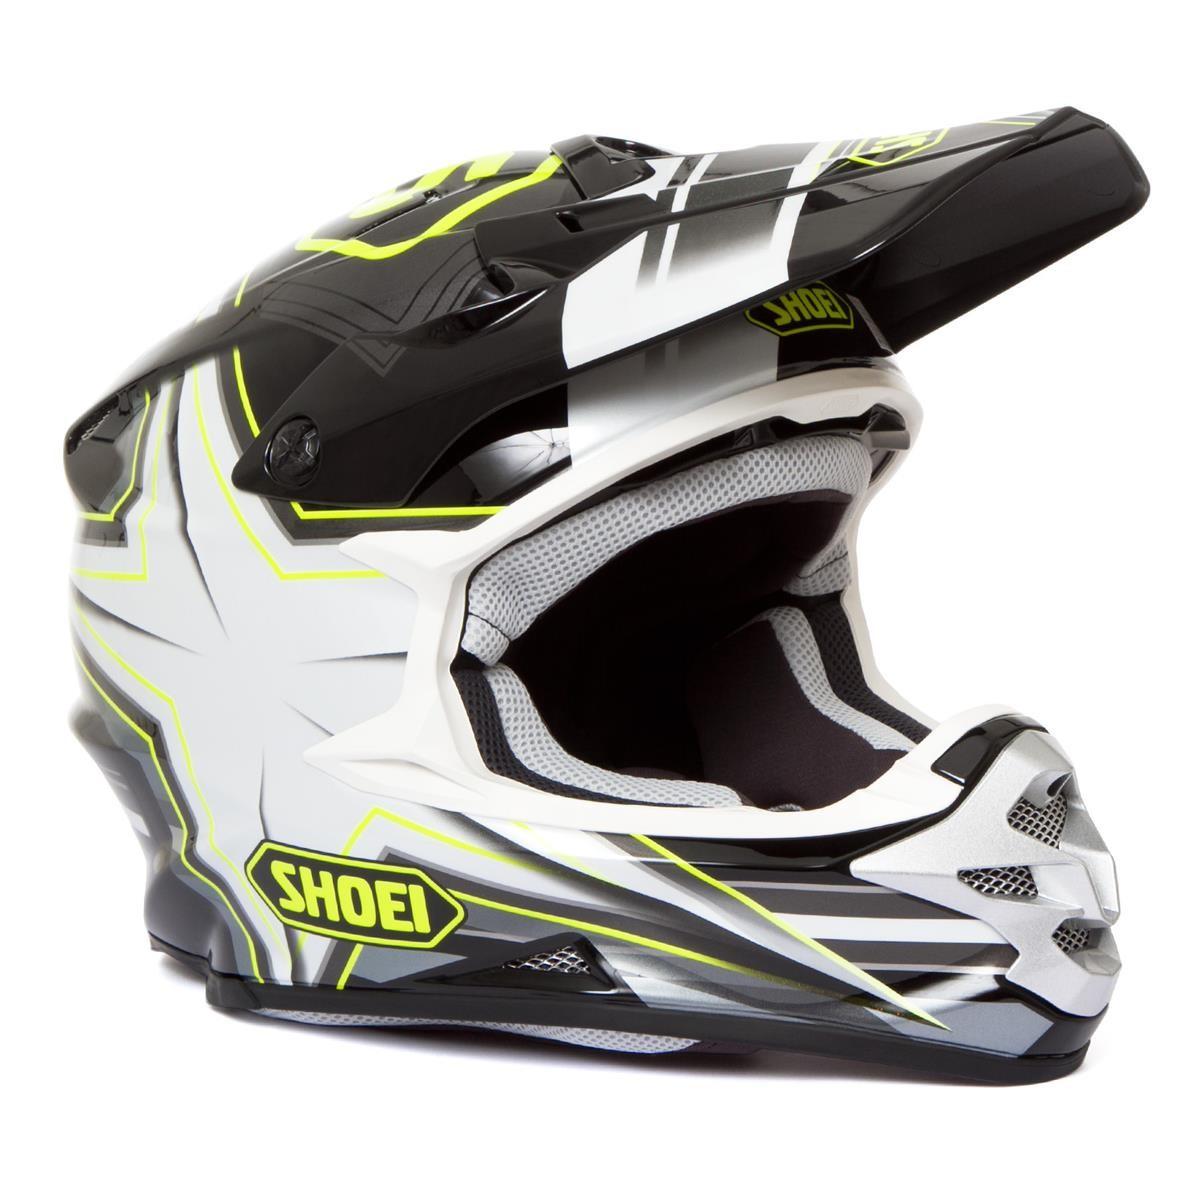 shoei helm mx motocross enduro quad vfx w reputation tc 3 neu ebay. Black Bedroom Furniture Sets. Home Design Ideas